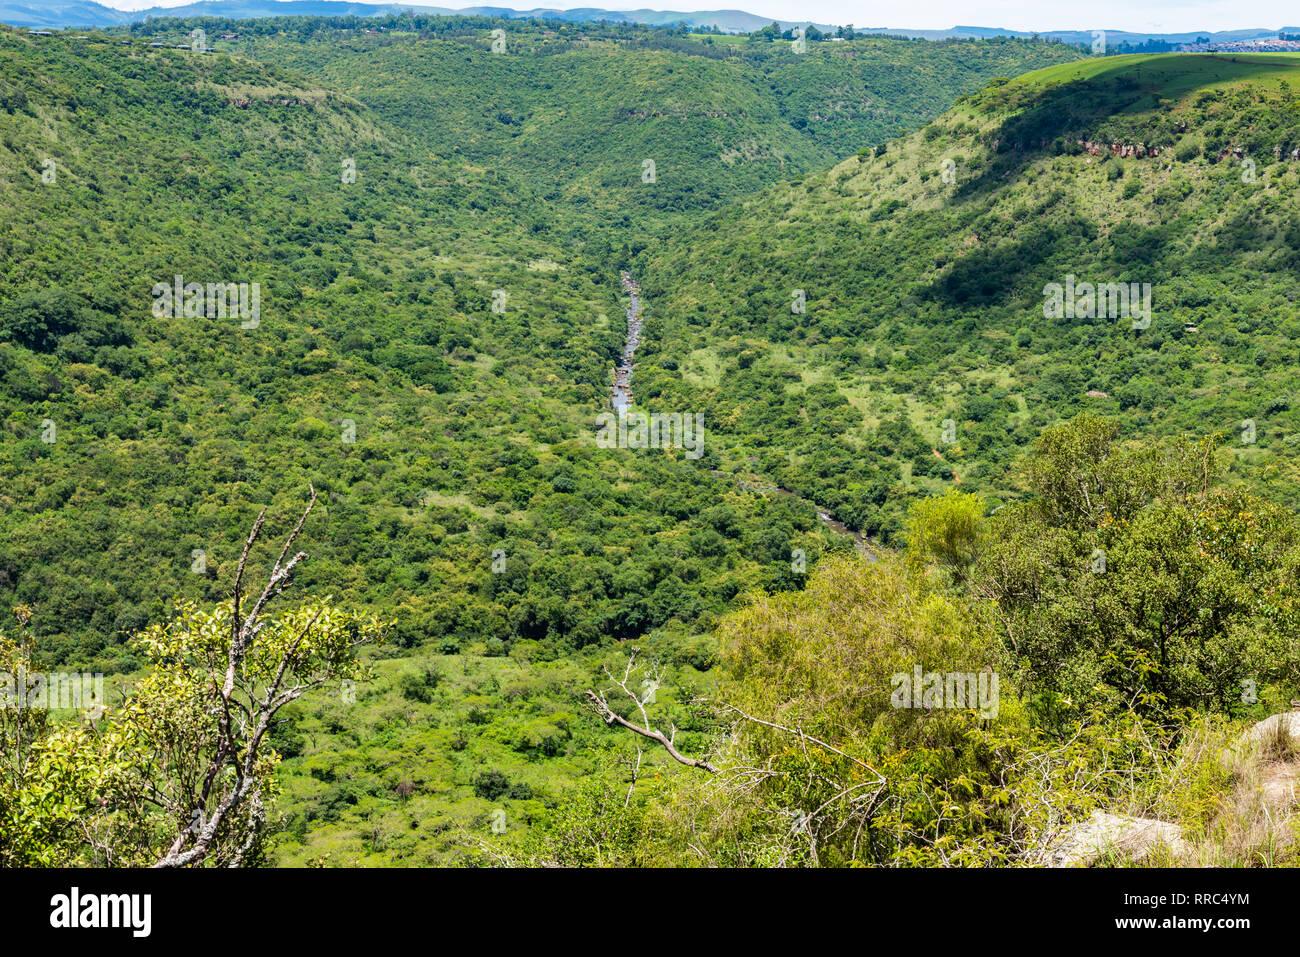 The Umgeni River Valley, Kwazulu Natal, South Africa. Stock Photo